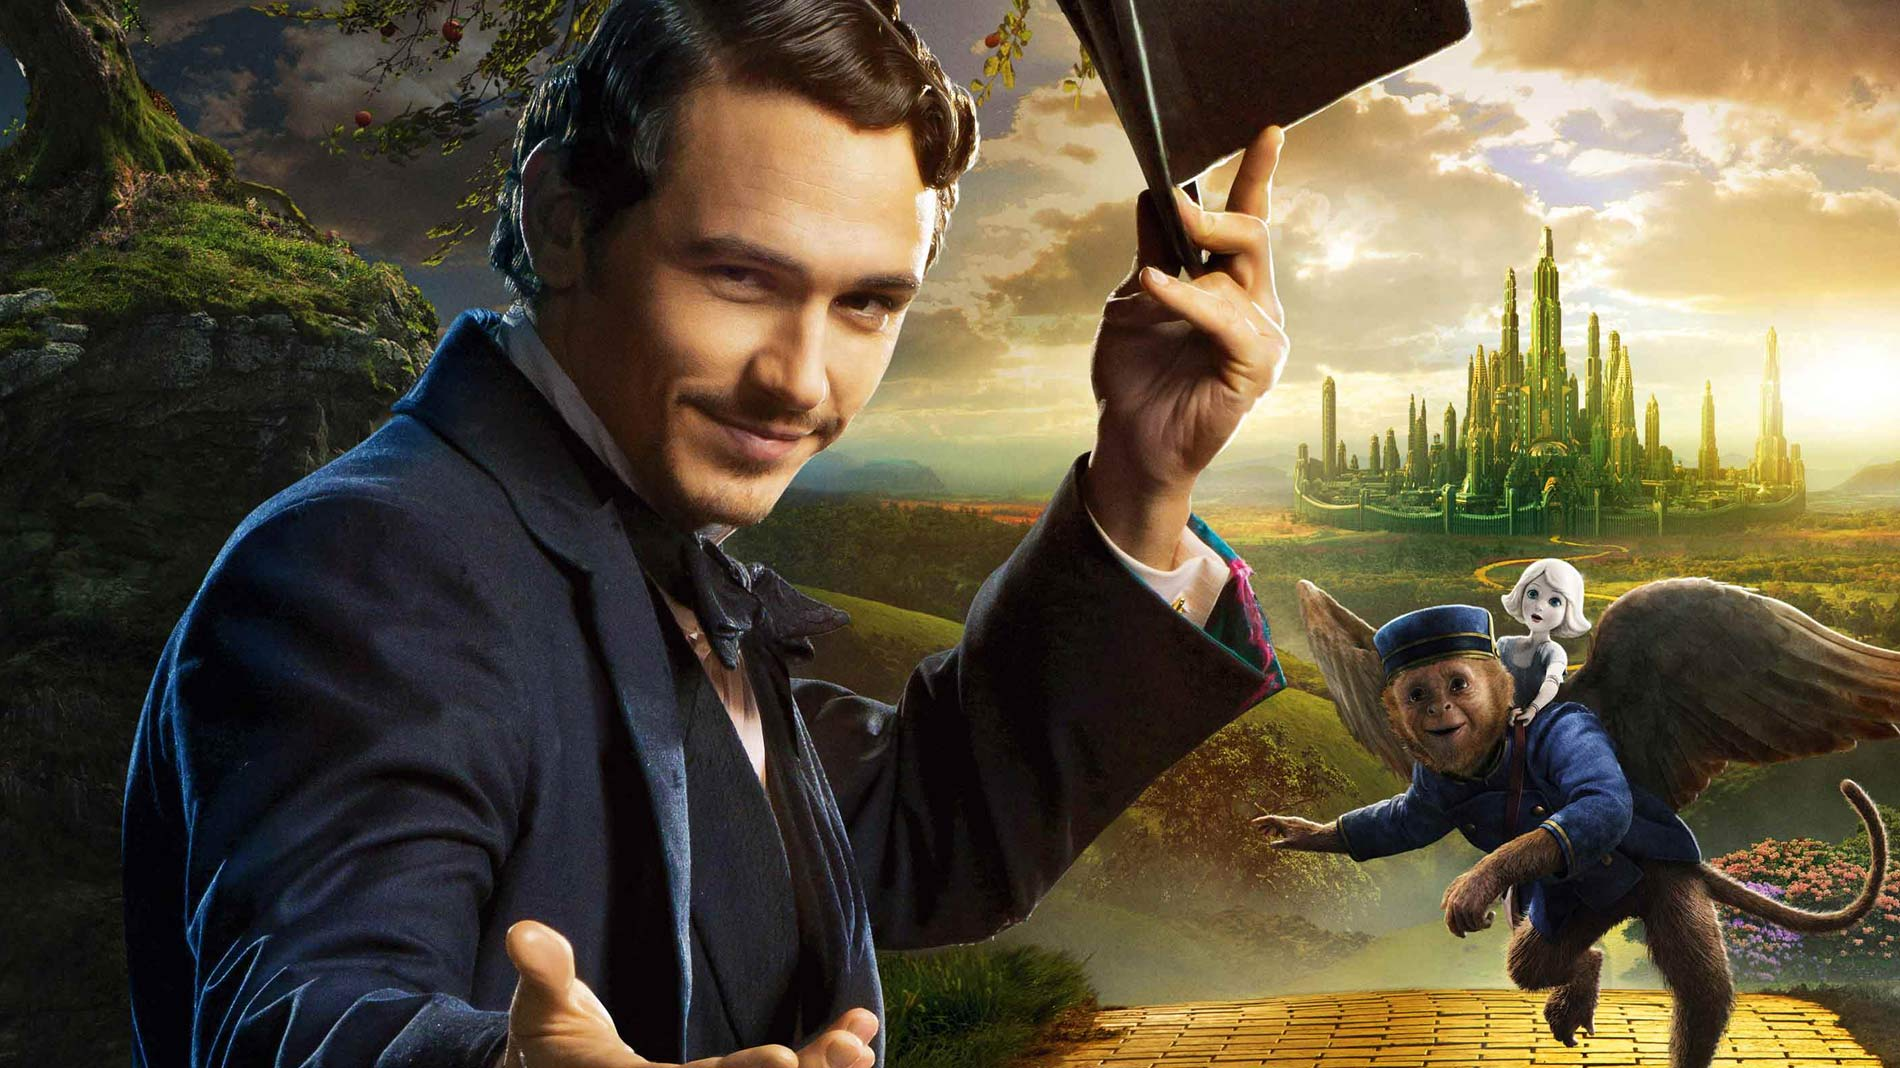 Oz-James Franco Google Cover